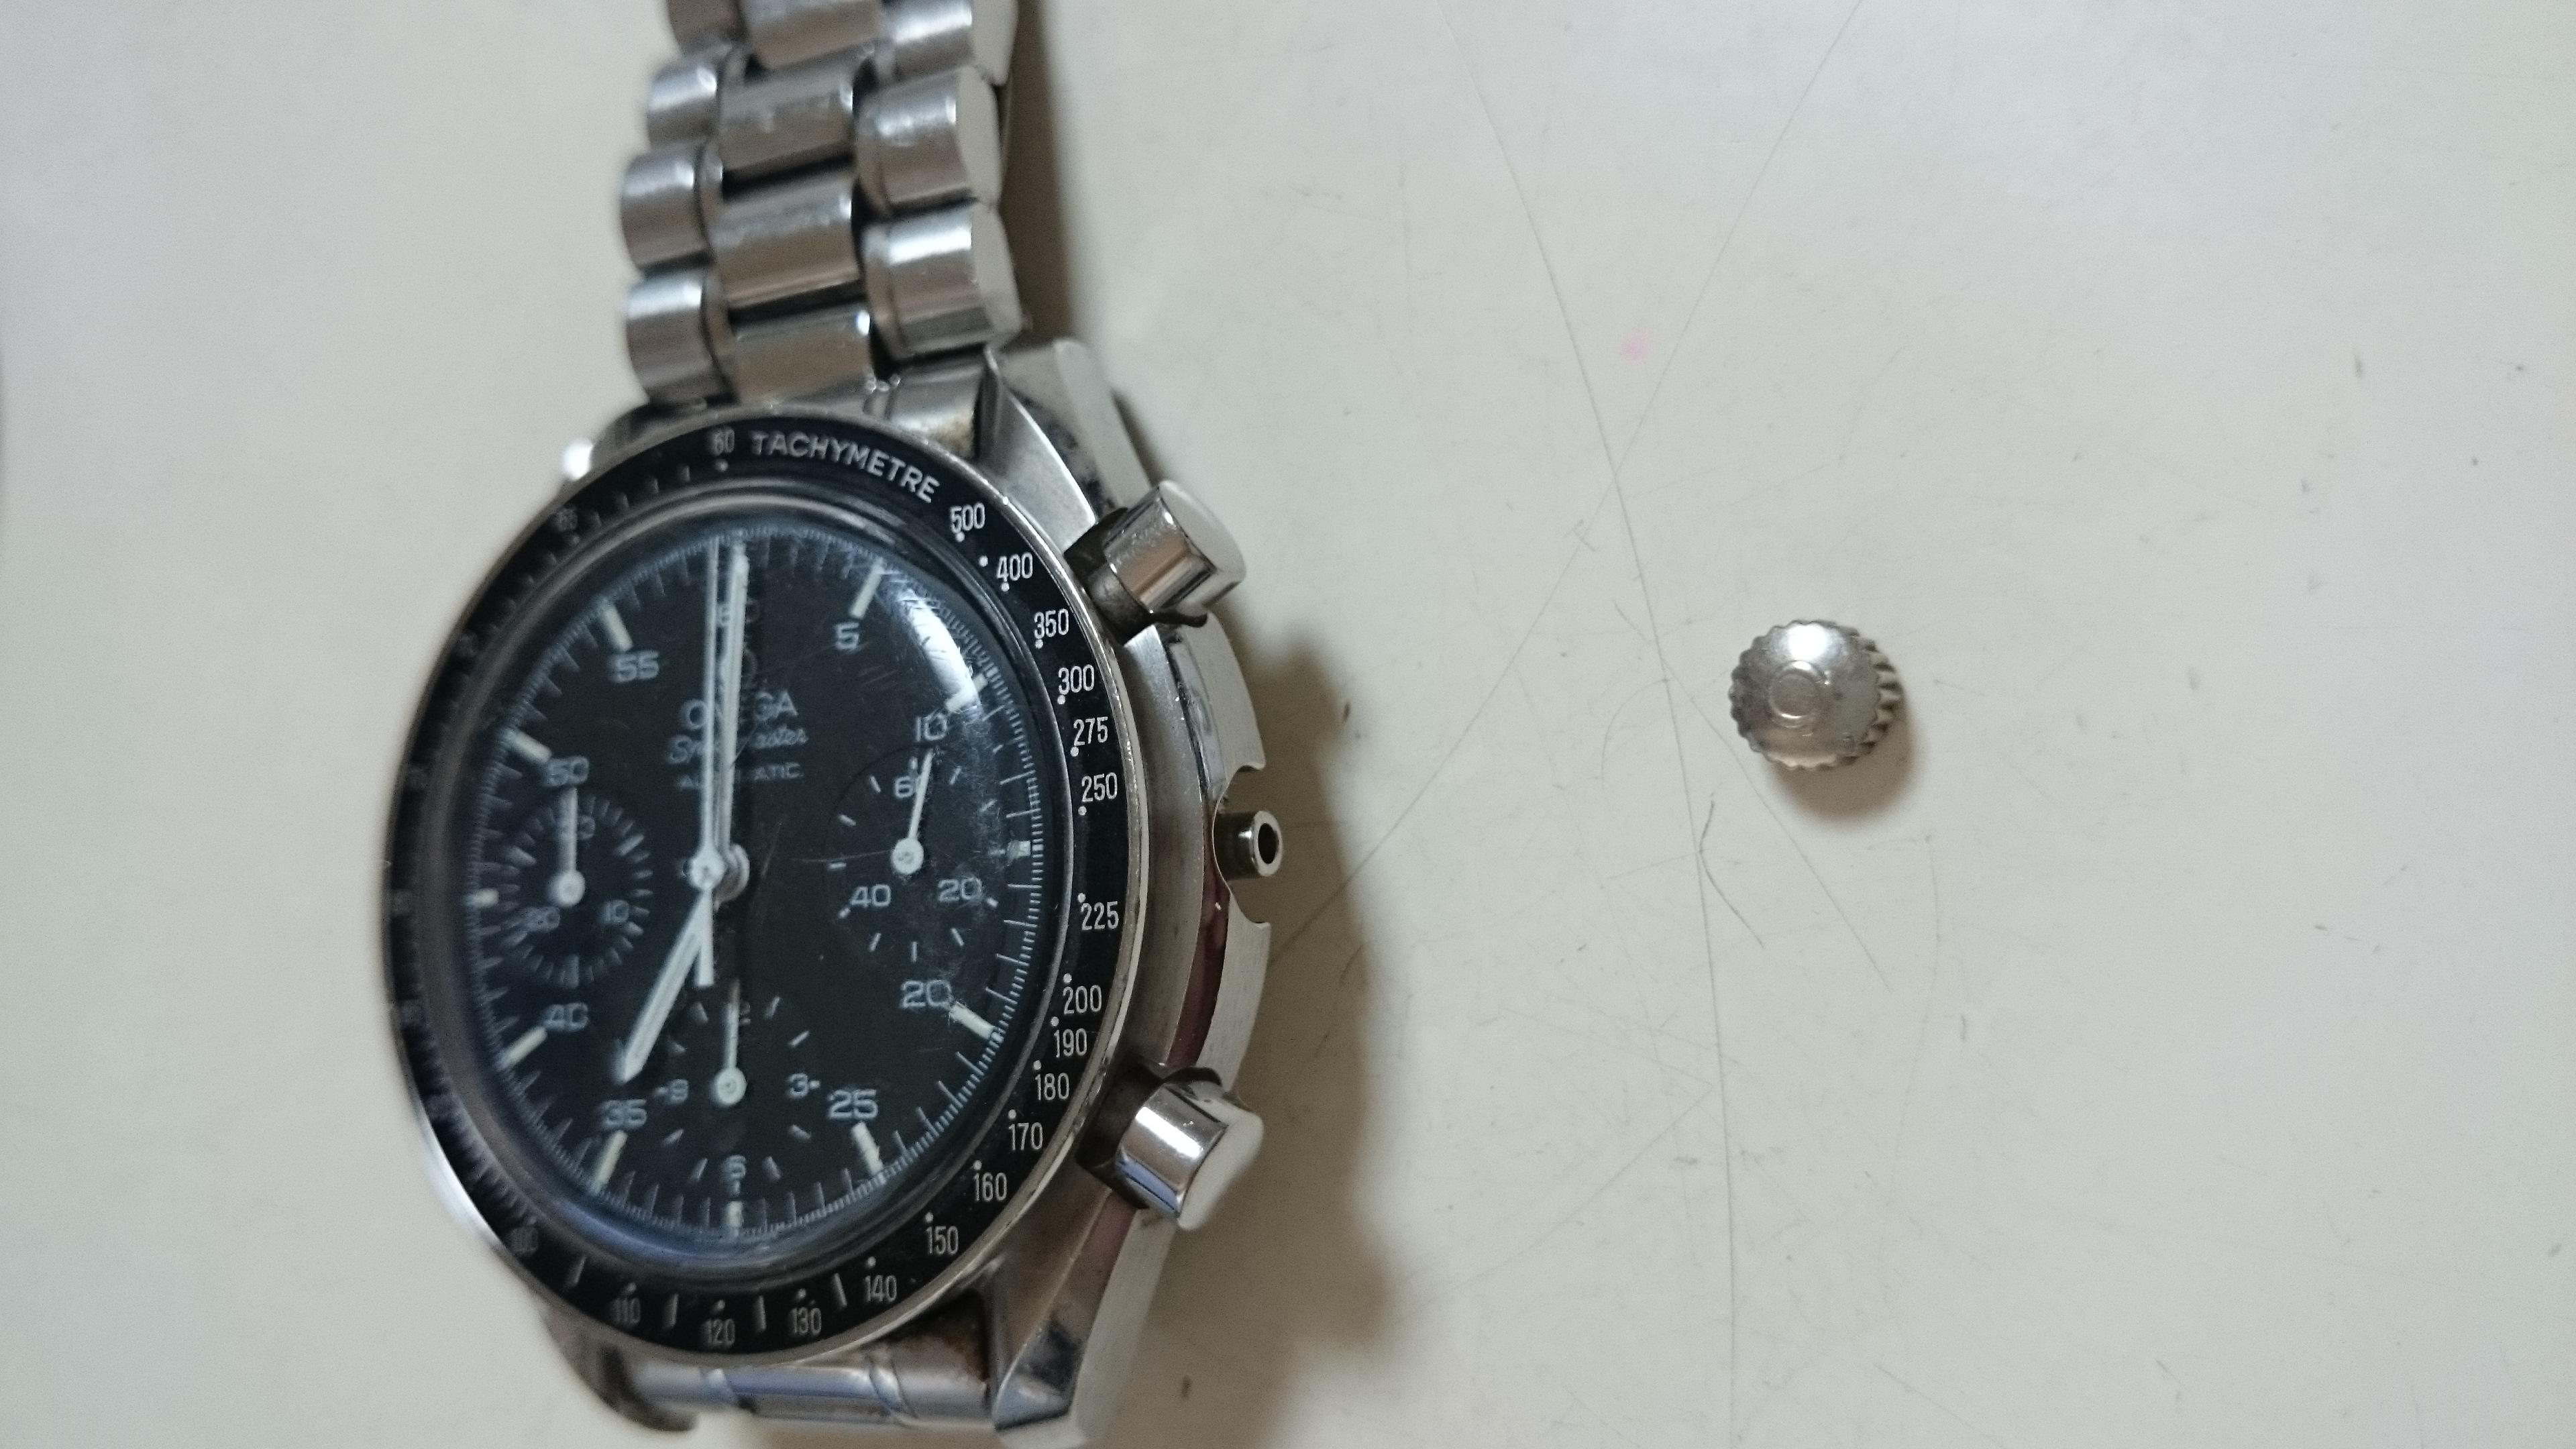 hot sale online 51114 2d752 オメガ スピードマスター | リューズ | 時計相談室 -時計の修理 ...